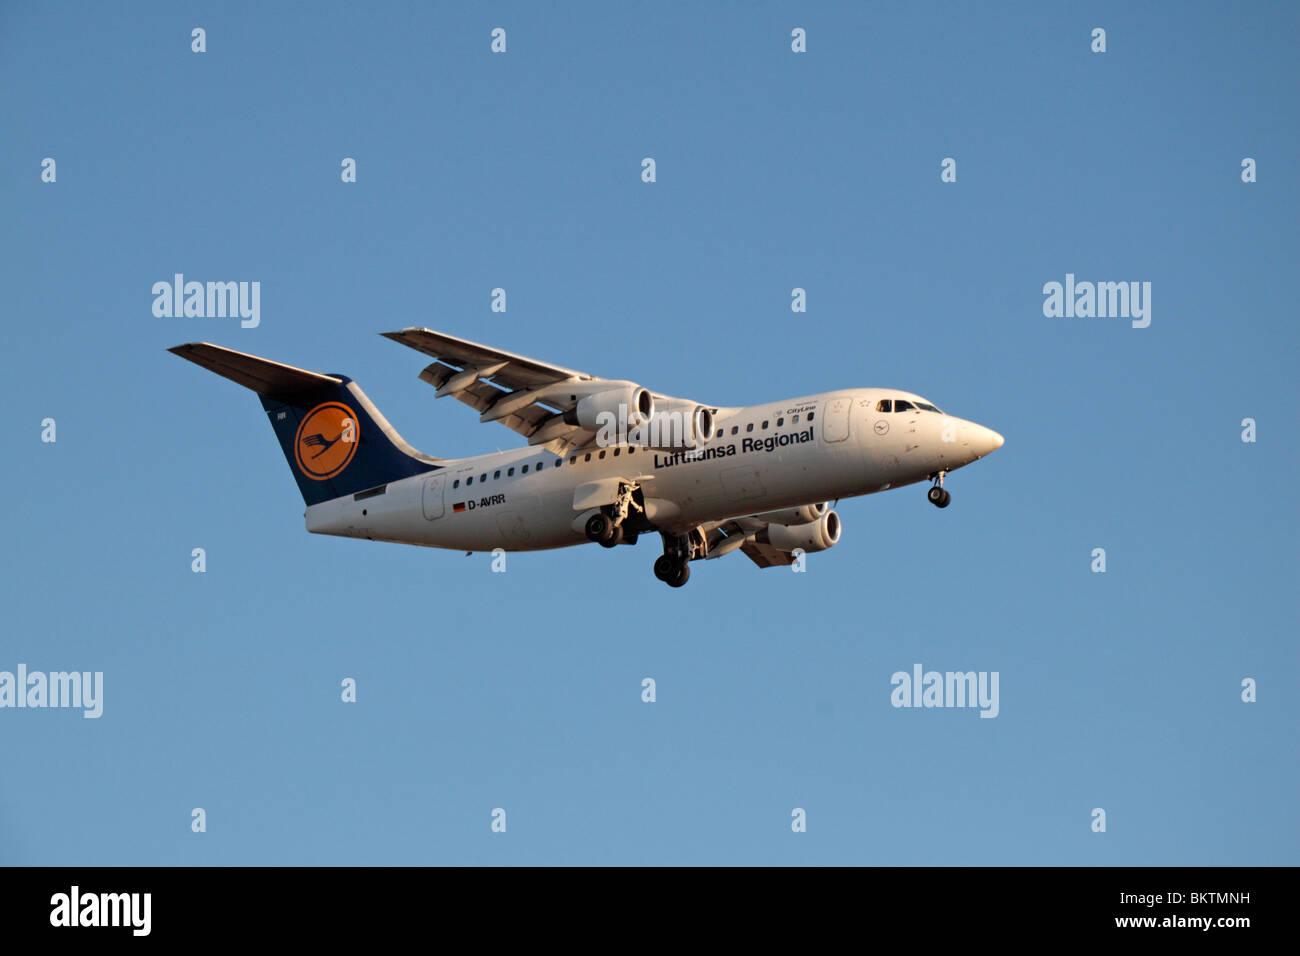 A Lufthansa Regional (Lufthansa CityLine) British Aerospace Avro 146-RJ85 landing at London Heathrow, UK.  Aug 2009. - Stock Image